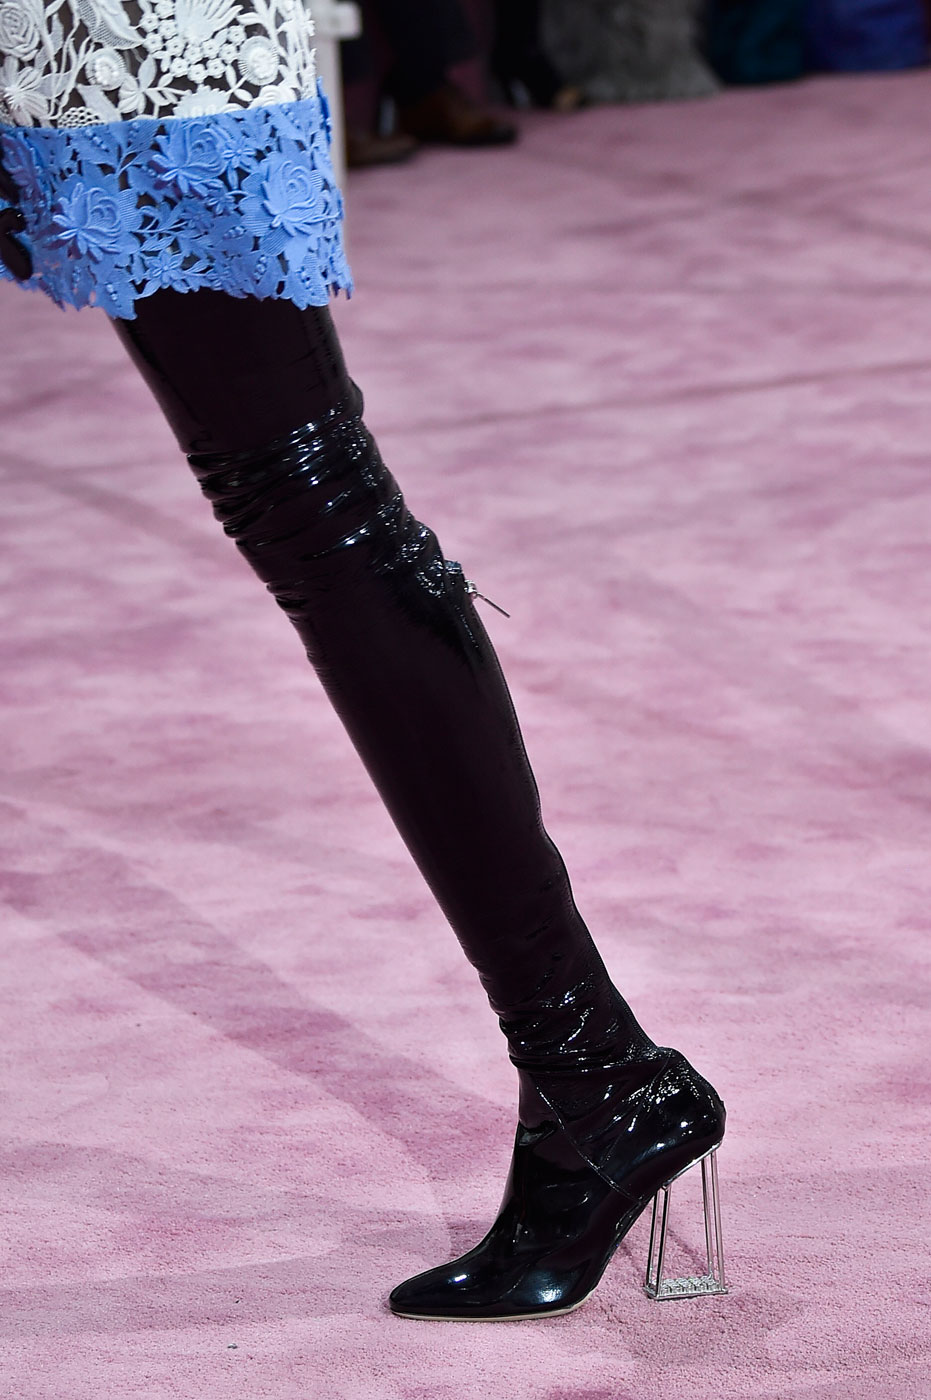 Christian-Dior-fashion-runway-show-close-ups-haute-couture-paris-spring-summer-2015-the-impression-174